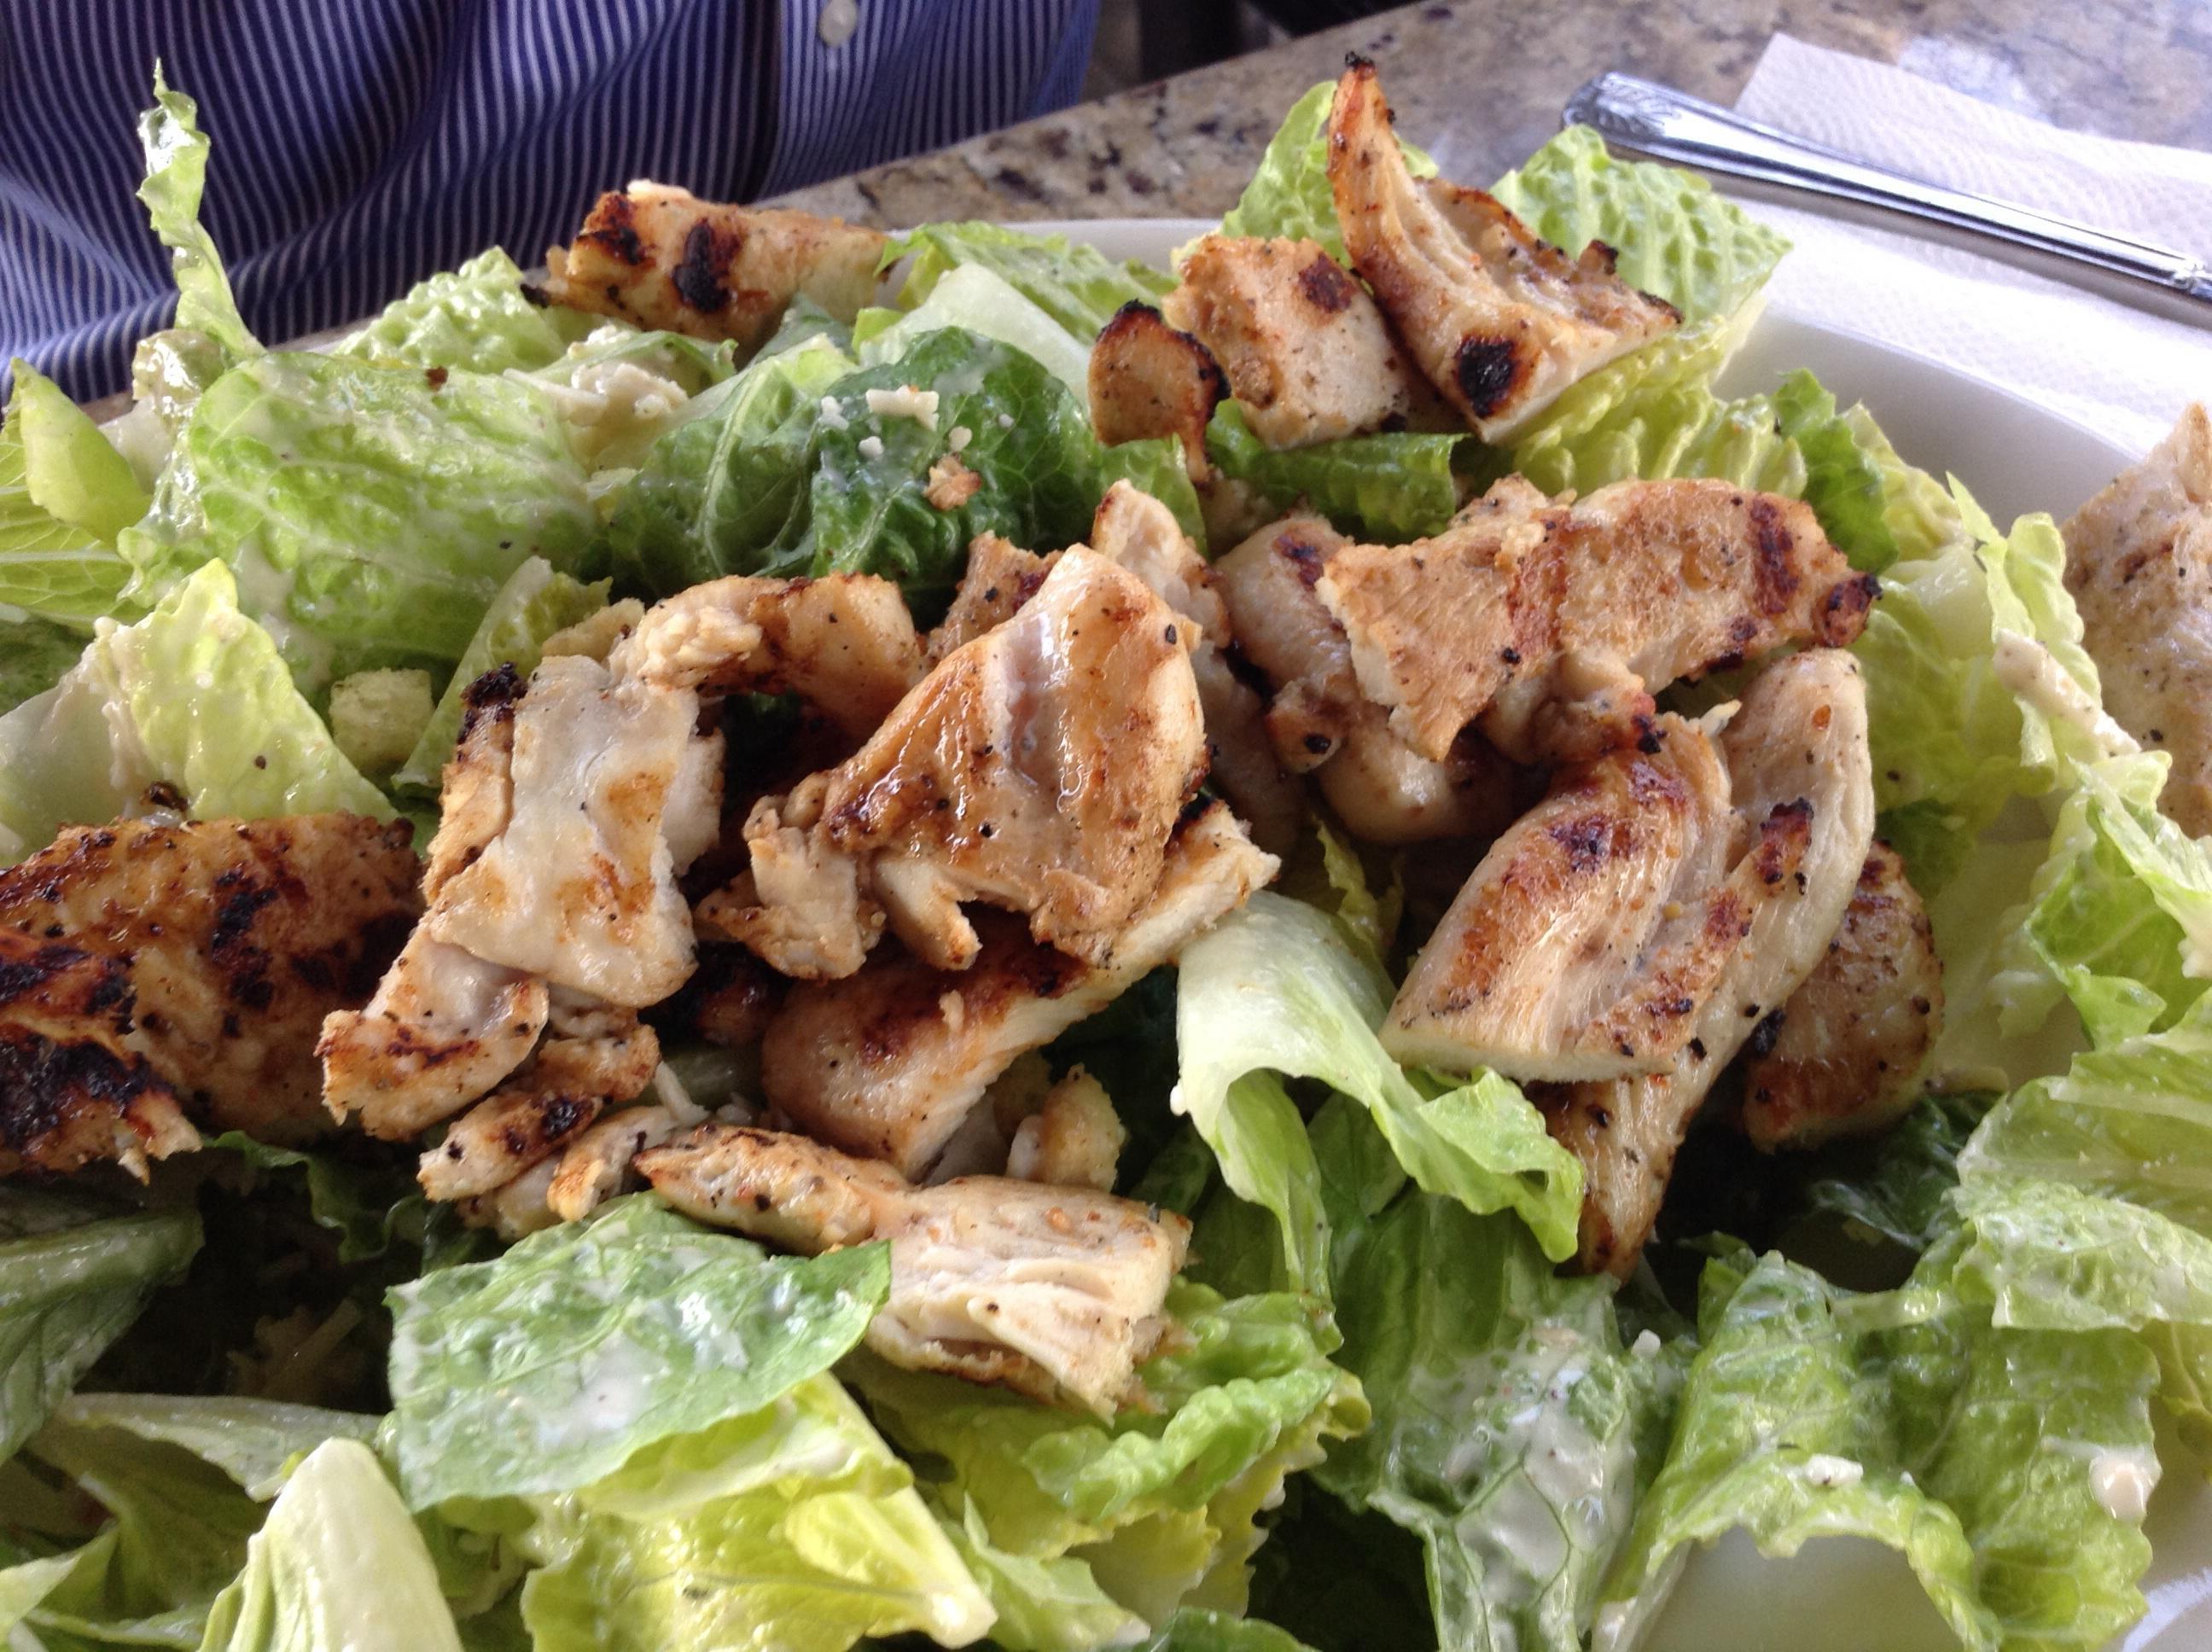 Joe's $5 chicken salad